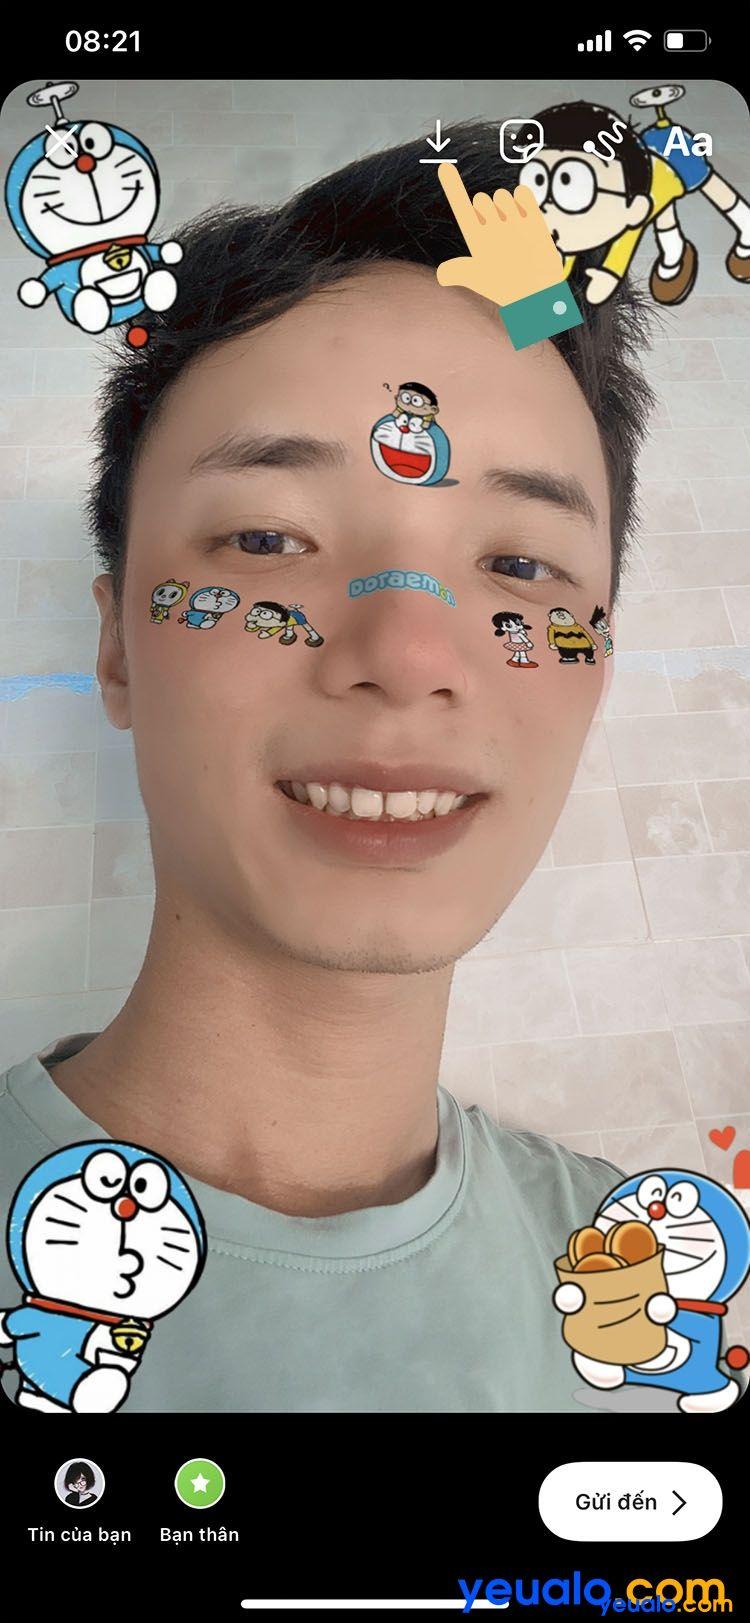 Cách lấy sticker Doraemon trên nền nhạc TikTok 9